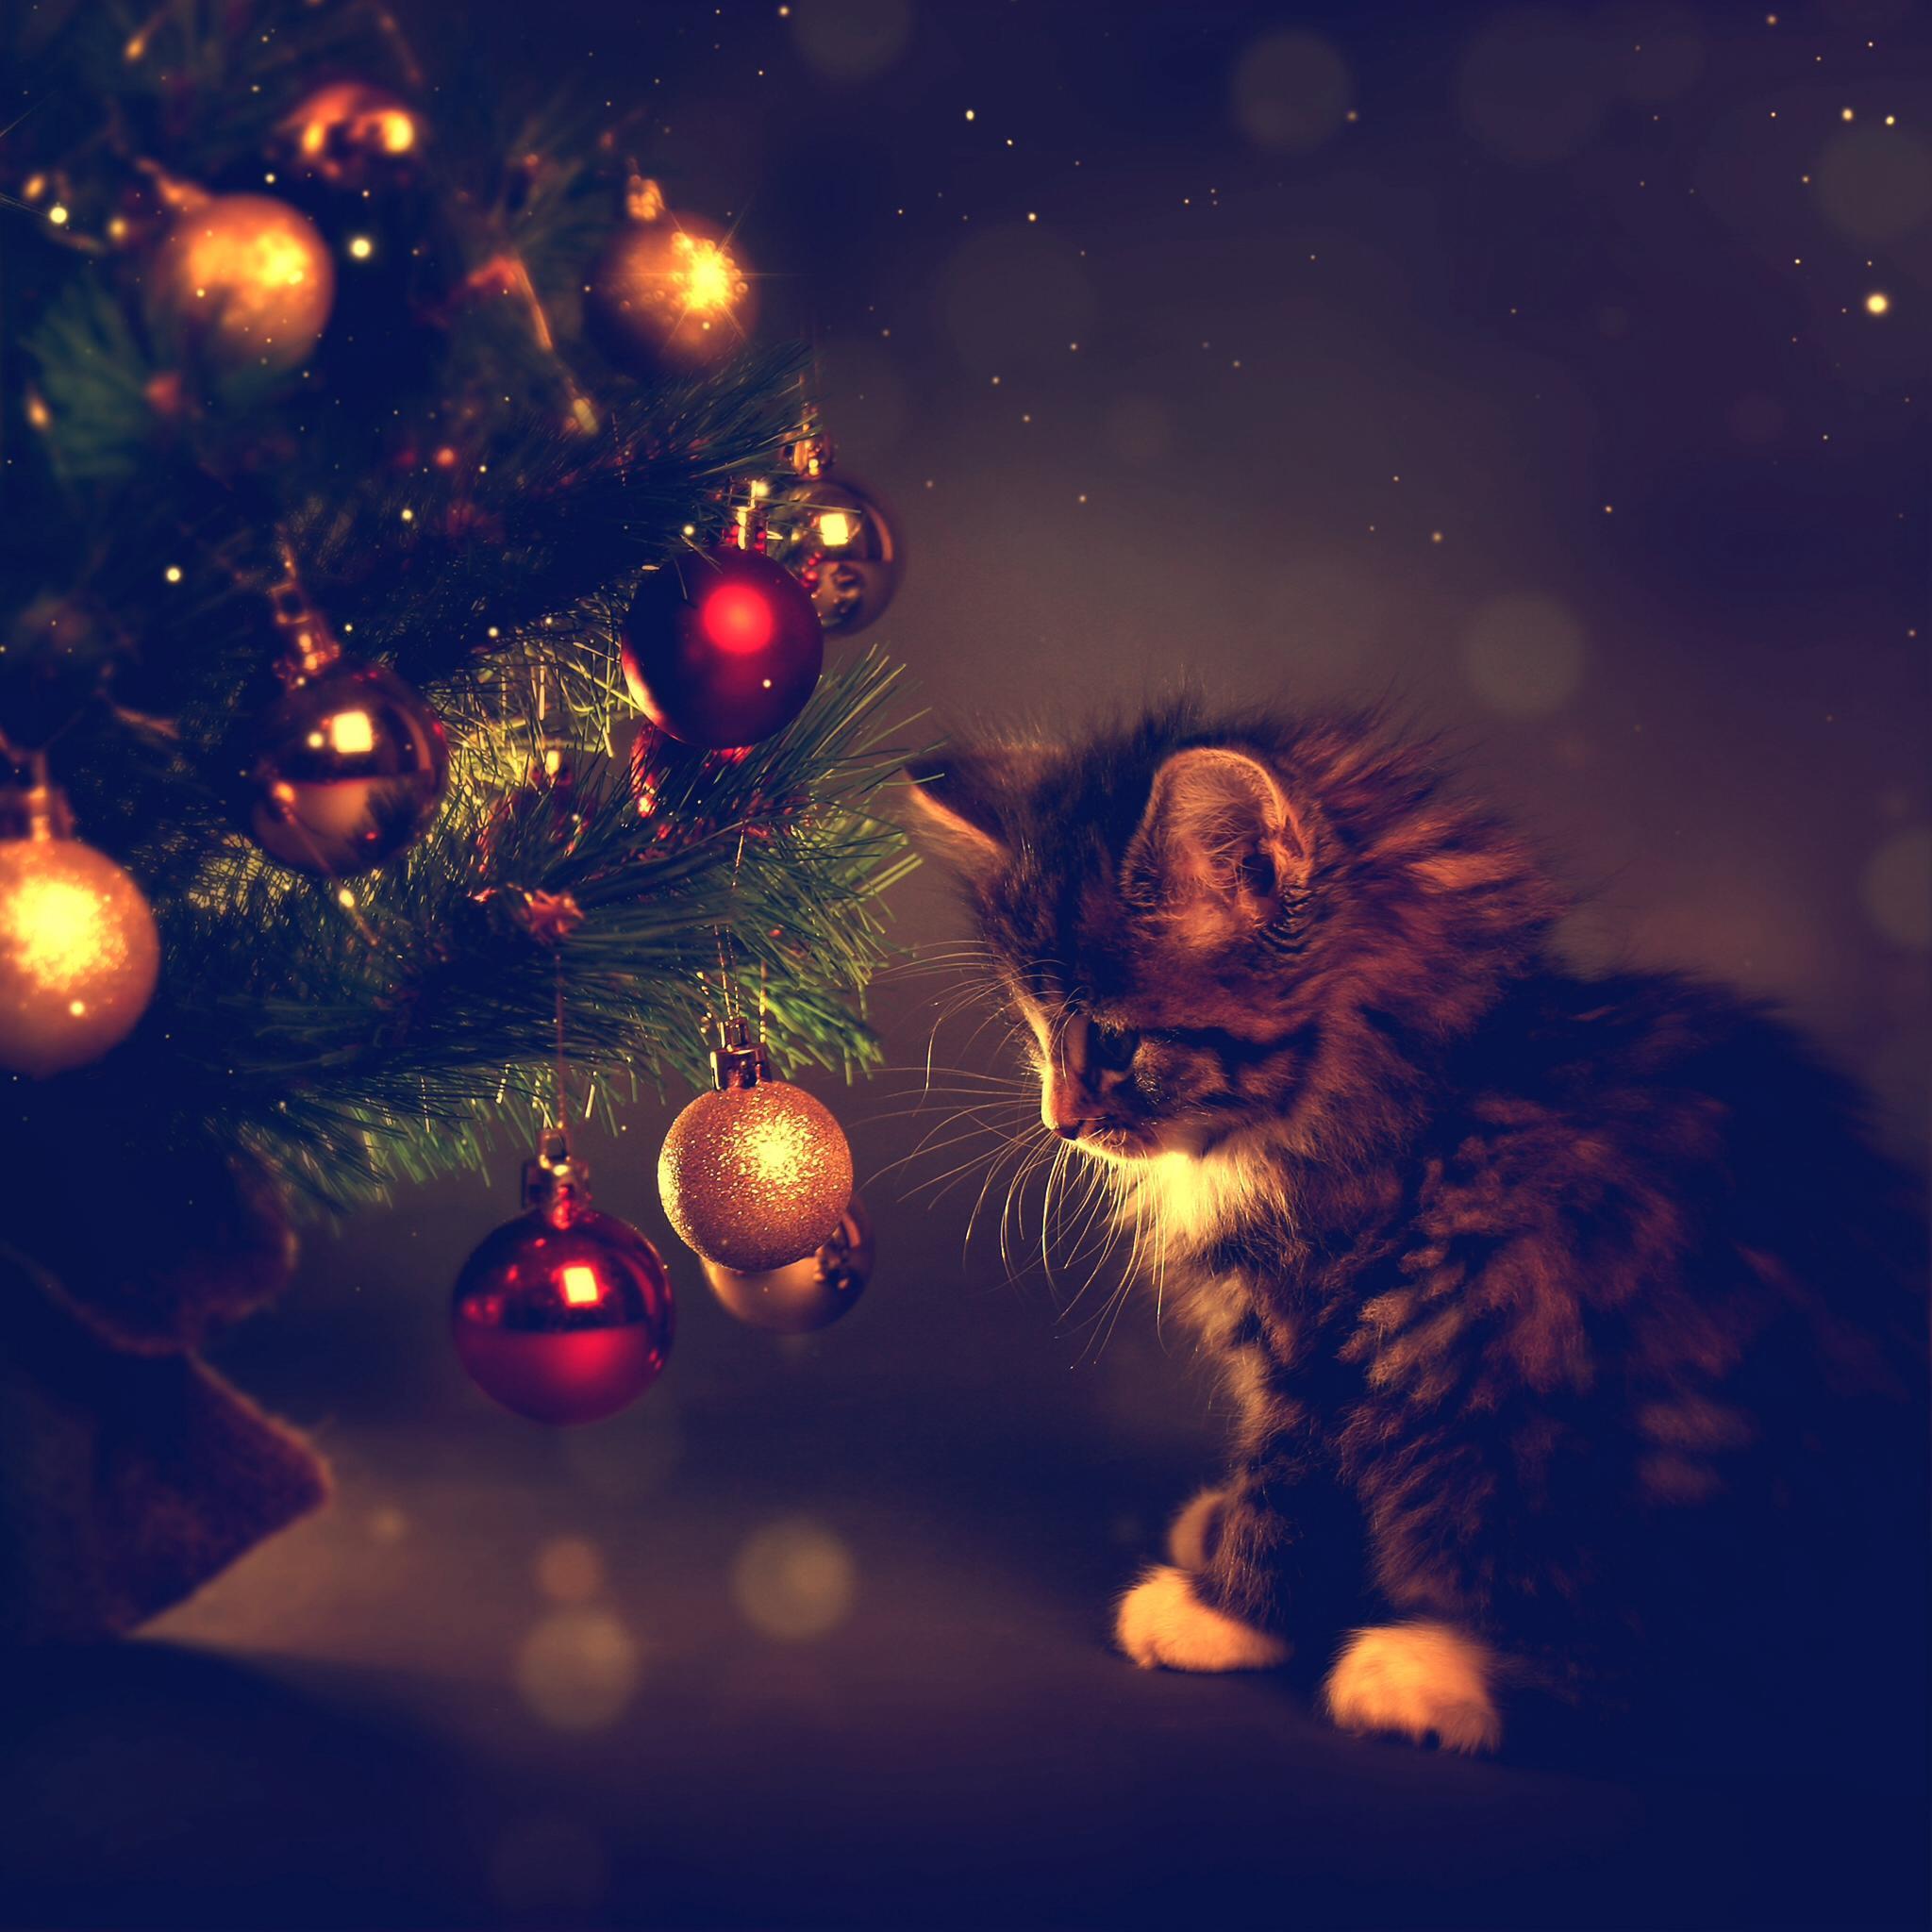 обои новогодняя ёлка, игрушки, котёнок, животное картинки фото